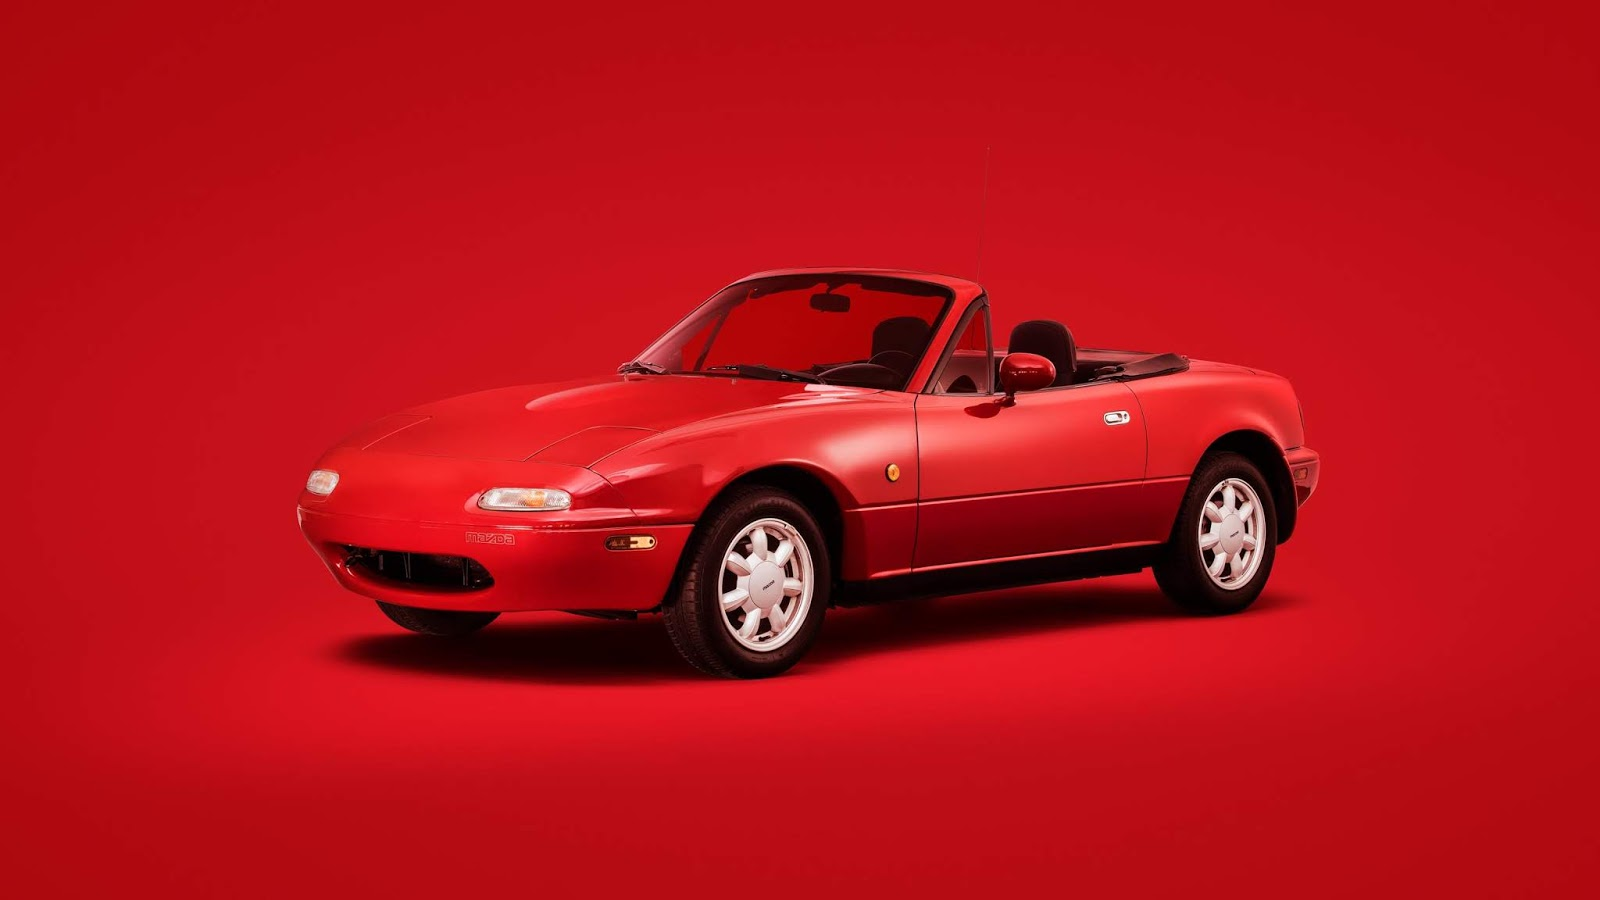 MX 5 0012B252812529 Ποια είναι τα σημαντικότερα ρεκόρ της Mazda